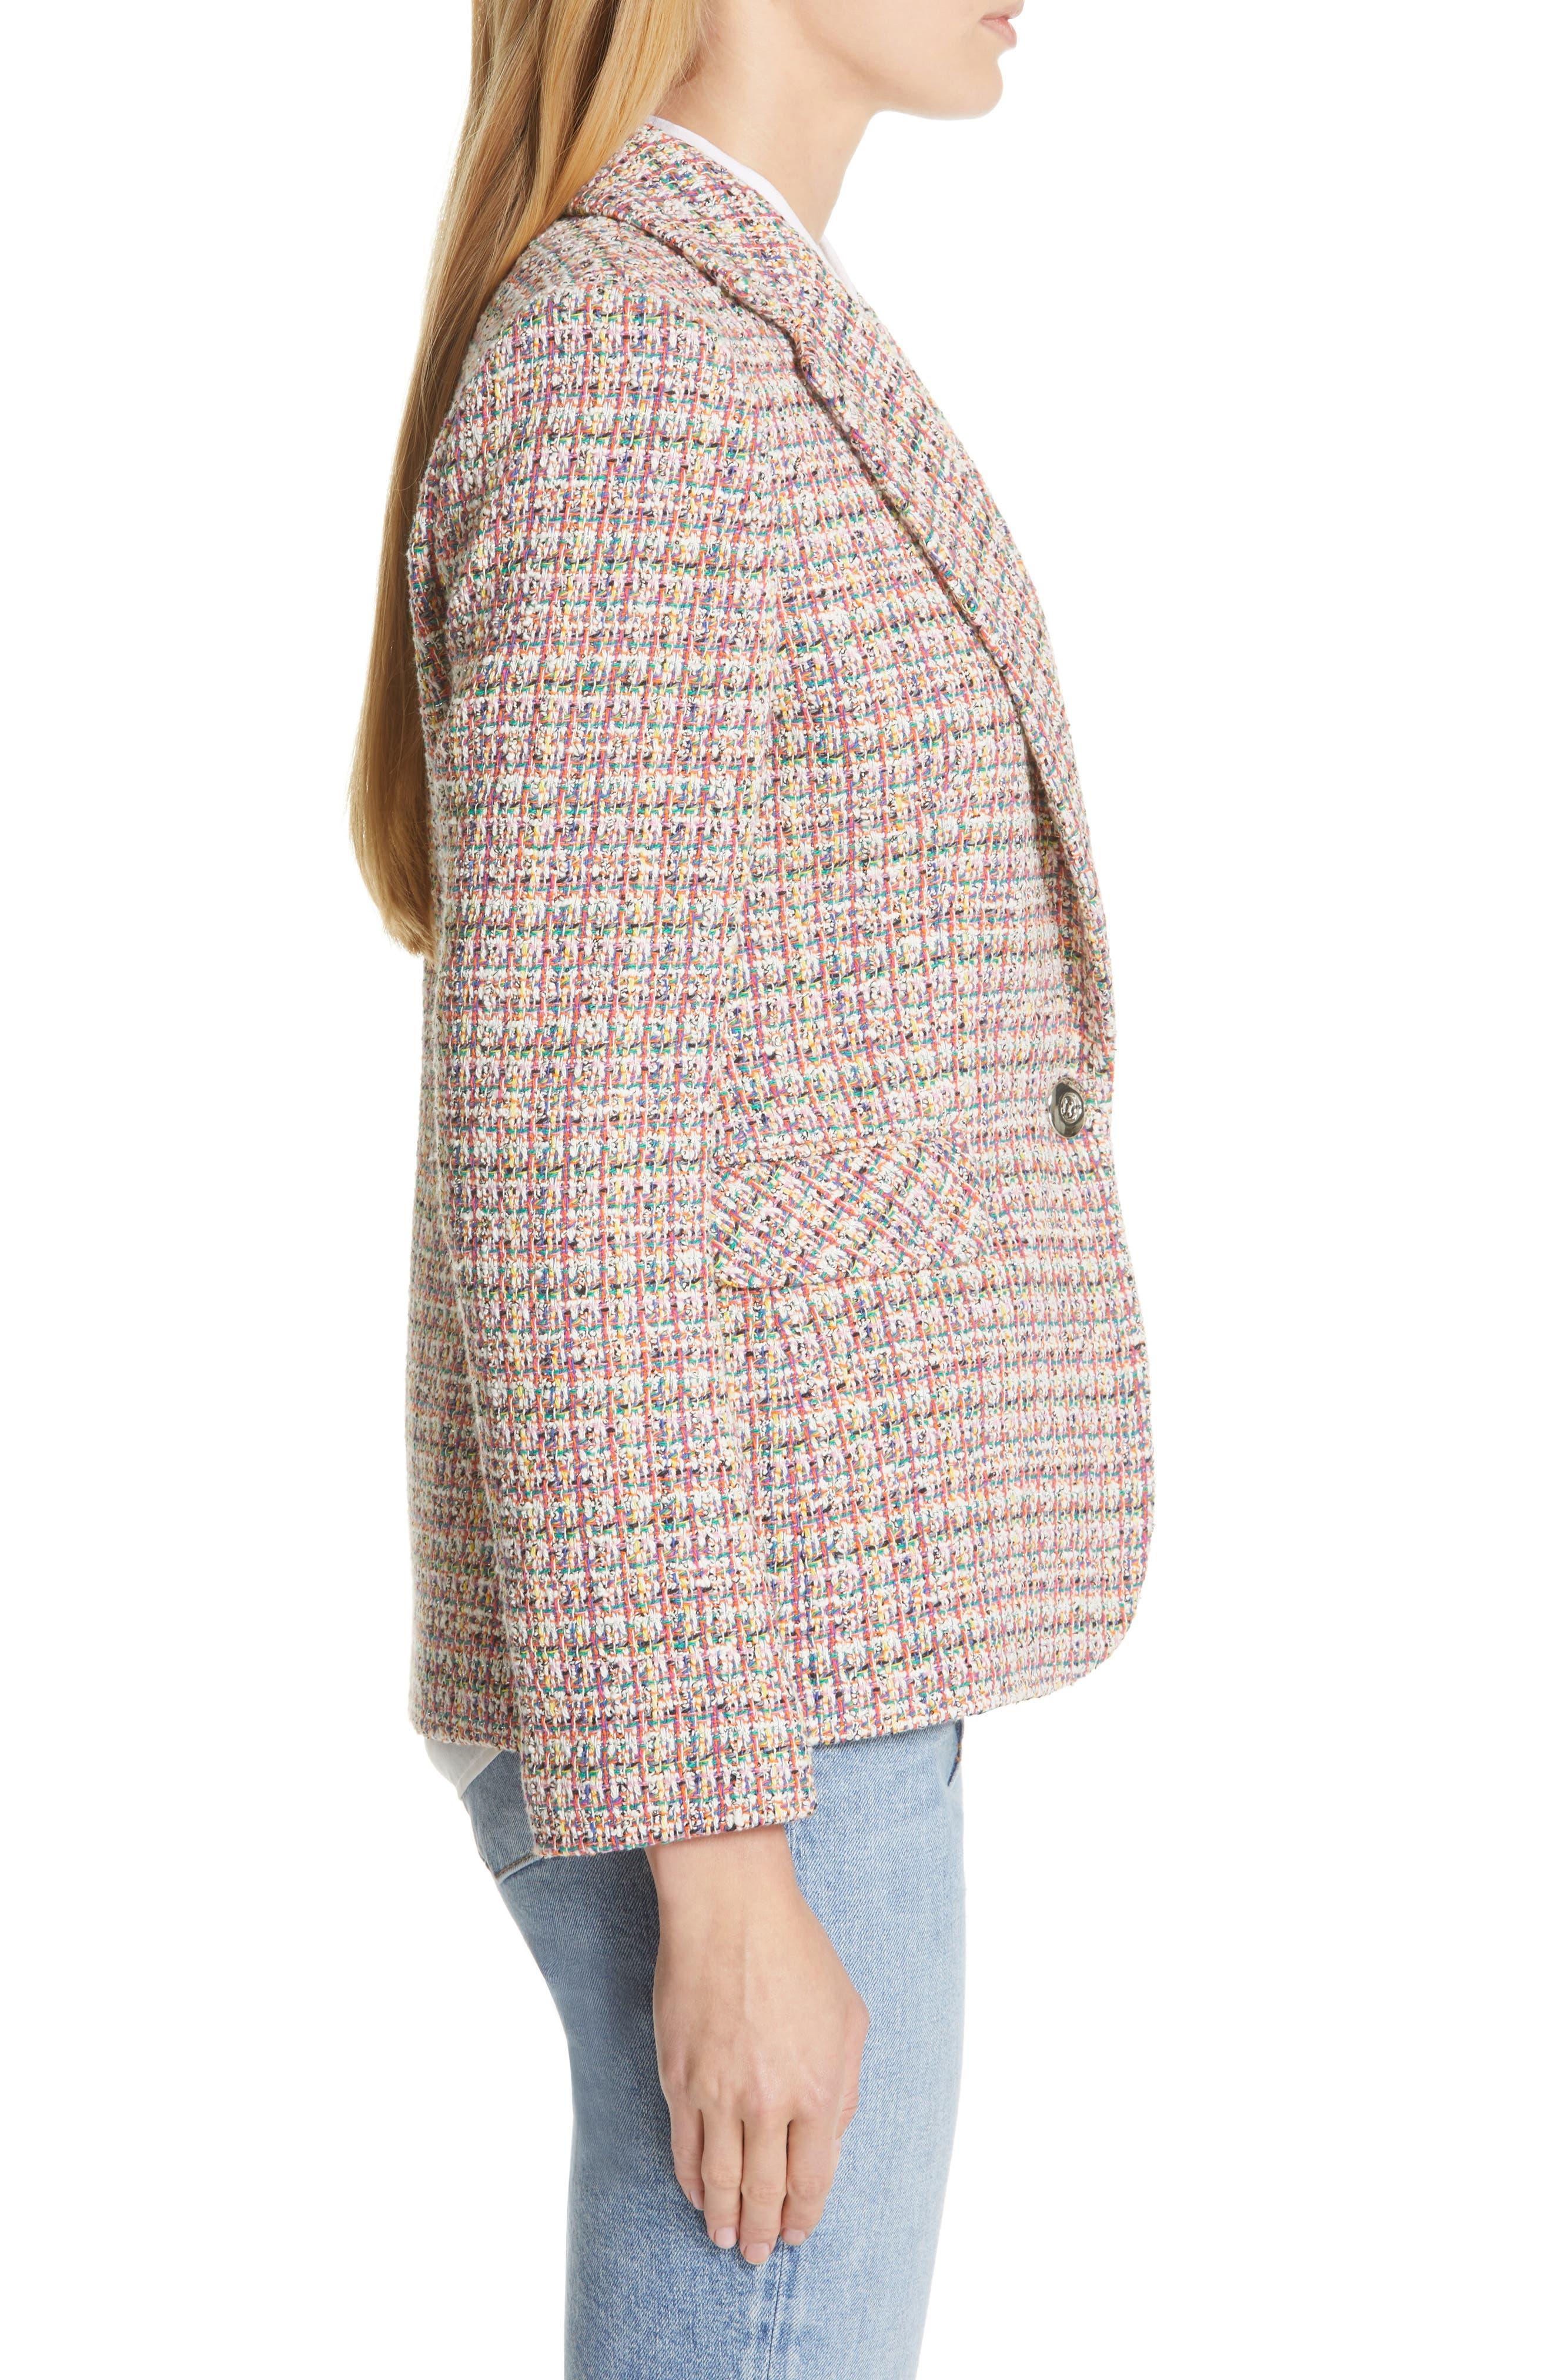 HELENE BERMAN, Colorful Tweed Blazer, Alternate thumbnail 3, color, ORANGE